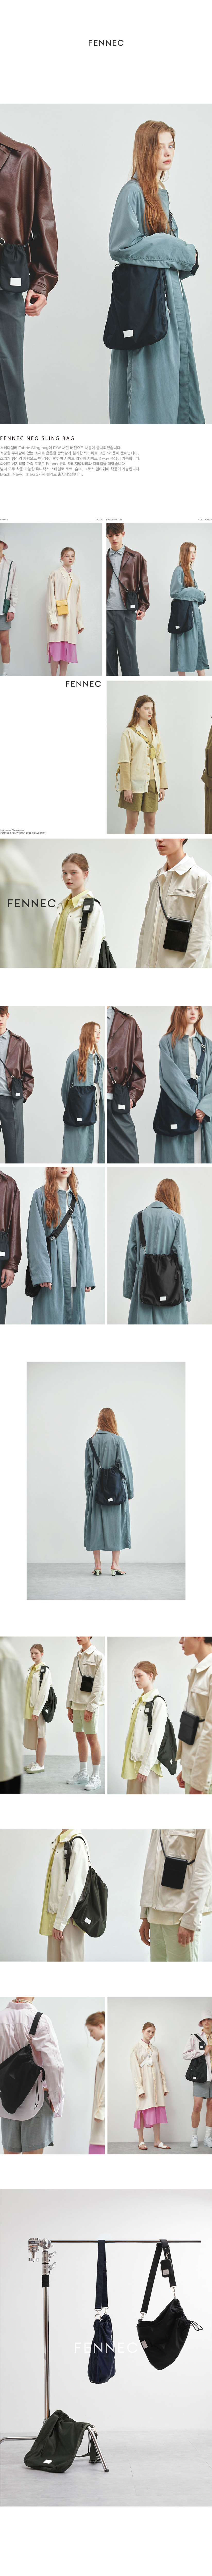 Neo-sling-bag-텐텐.jpg